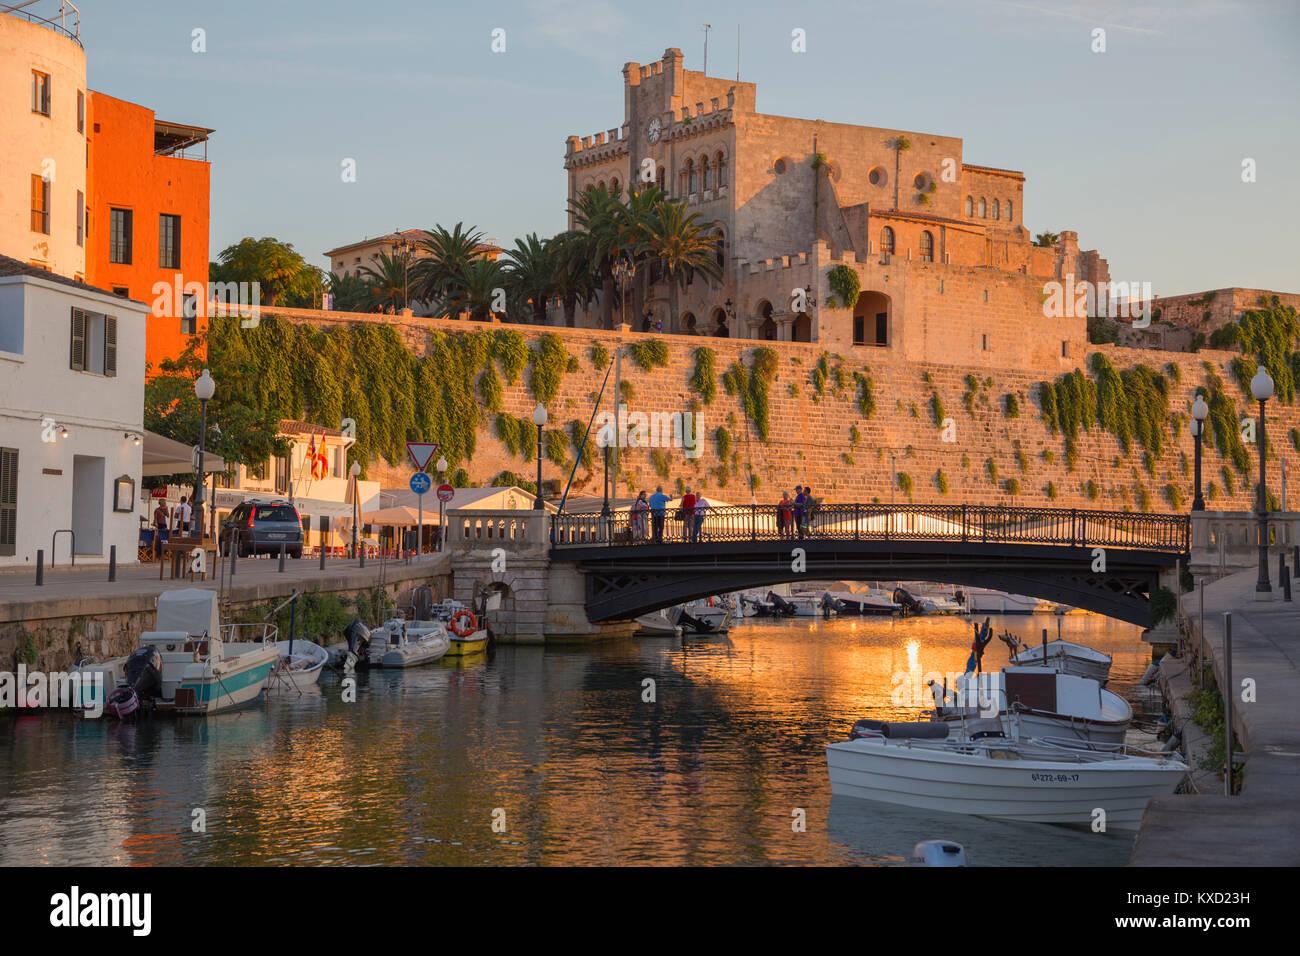 Vieux port historique de Ciutadella, Minorque, Espagne, Europe, Photo Stock